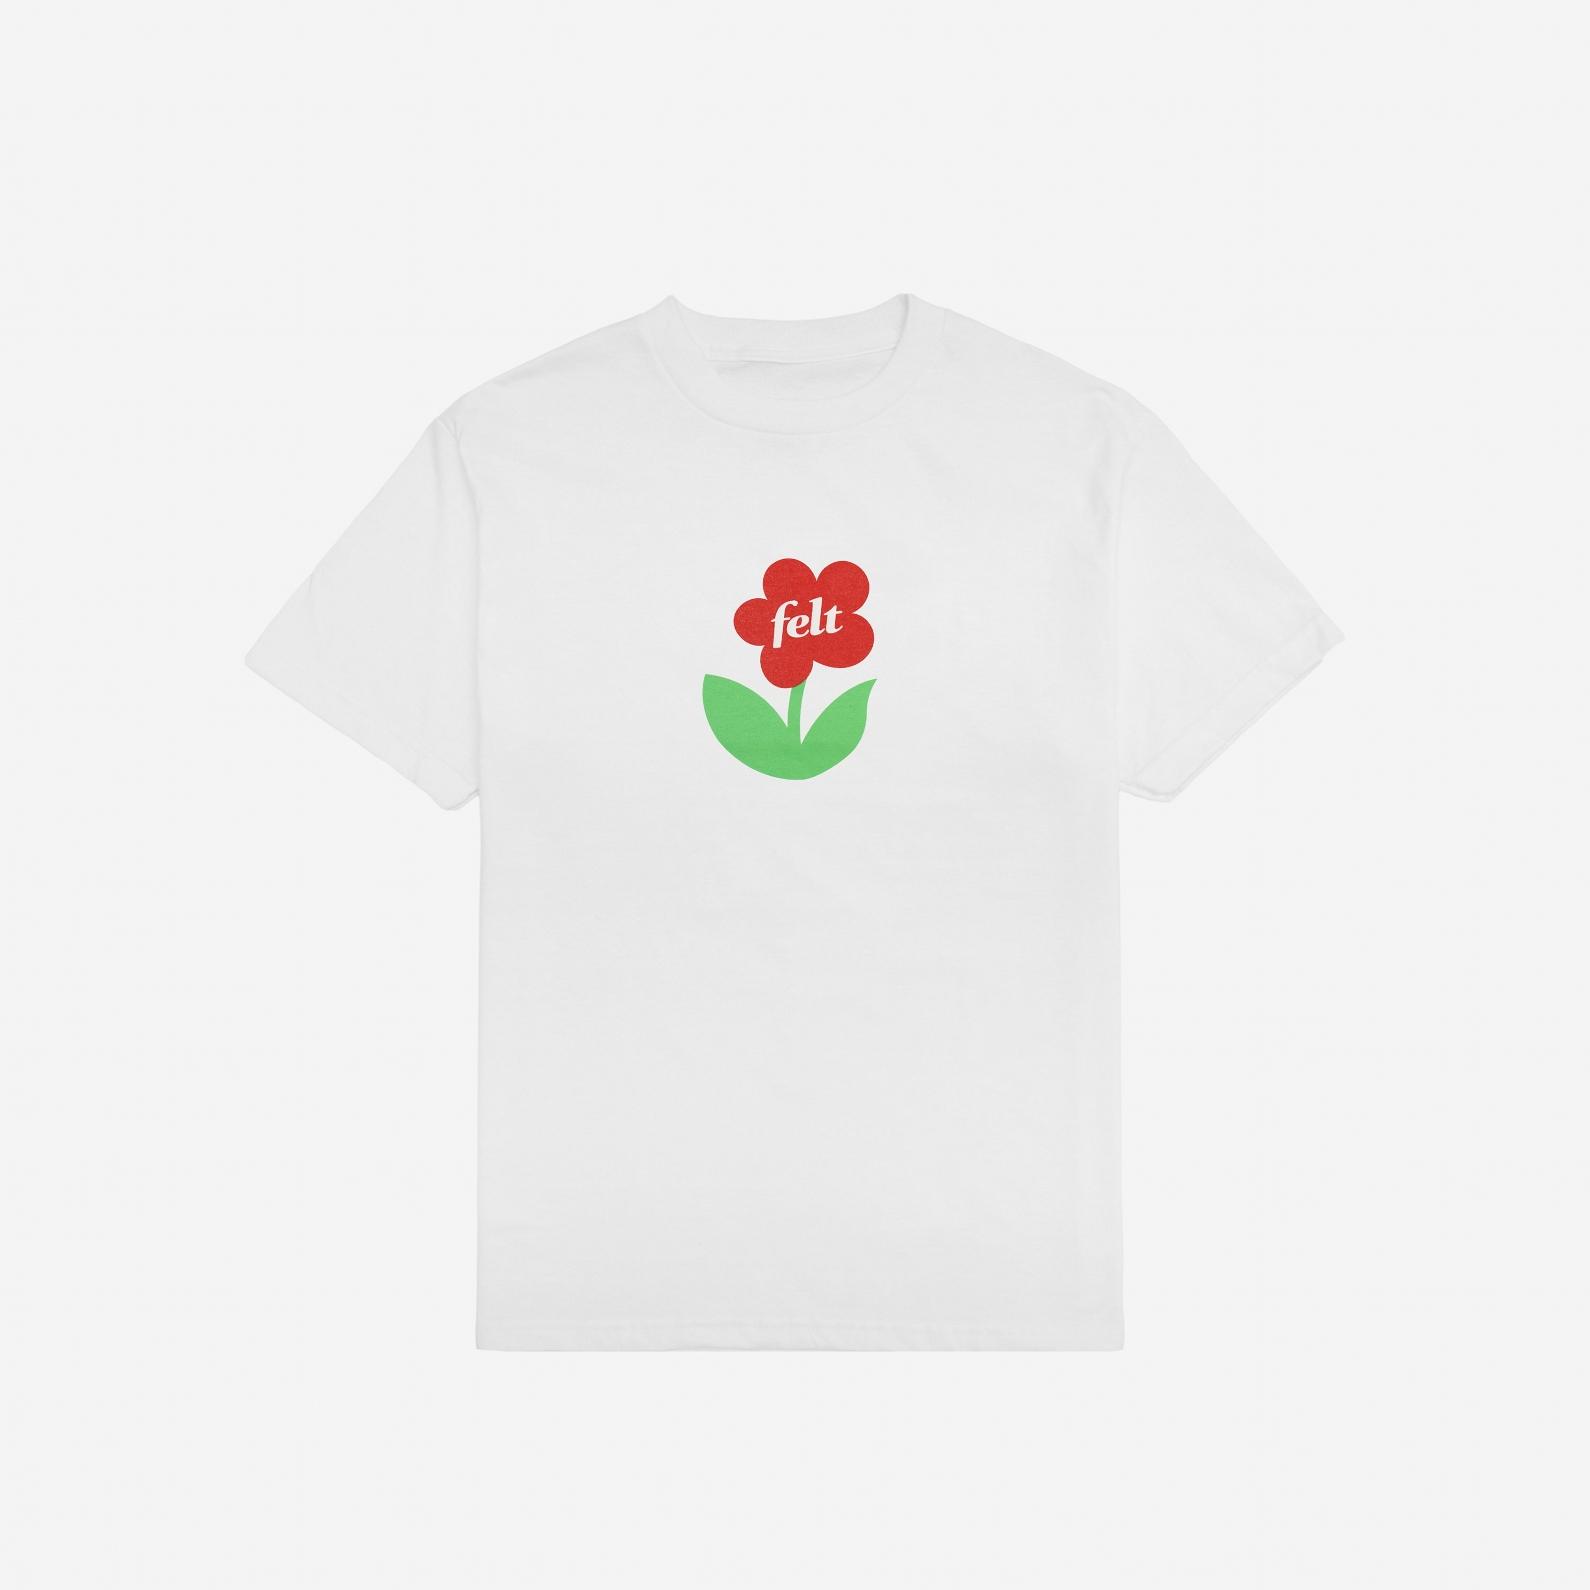 【FELT/フェルト】HEAVEN TEE SHIRT Tシャツ / WHITE